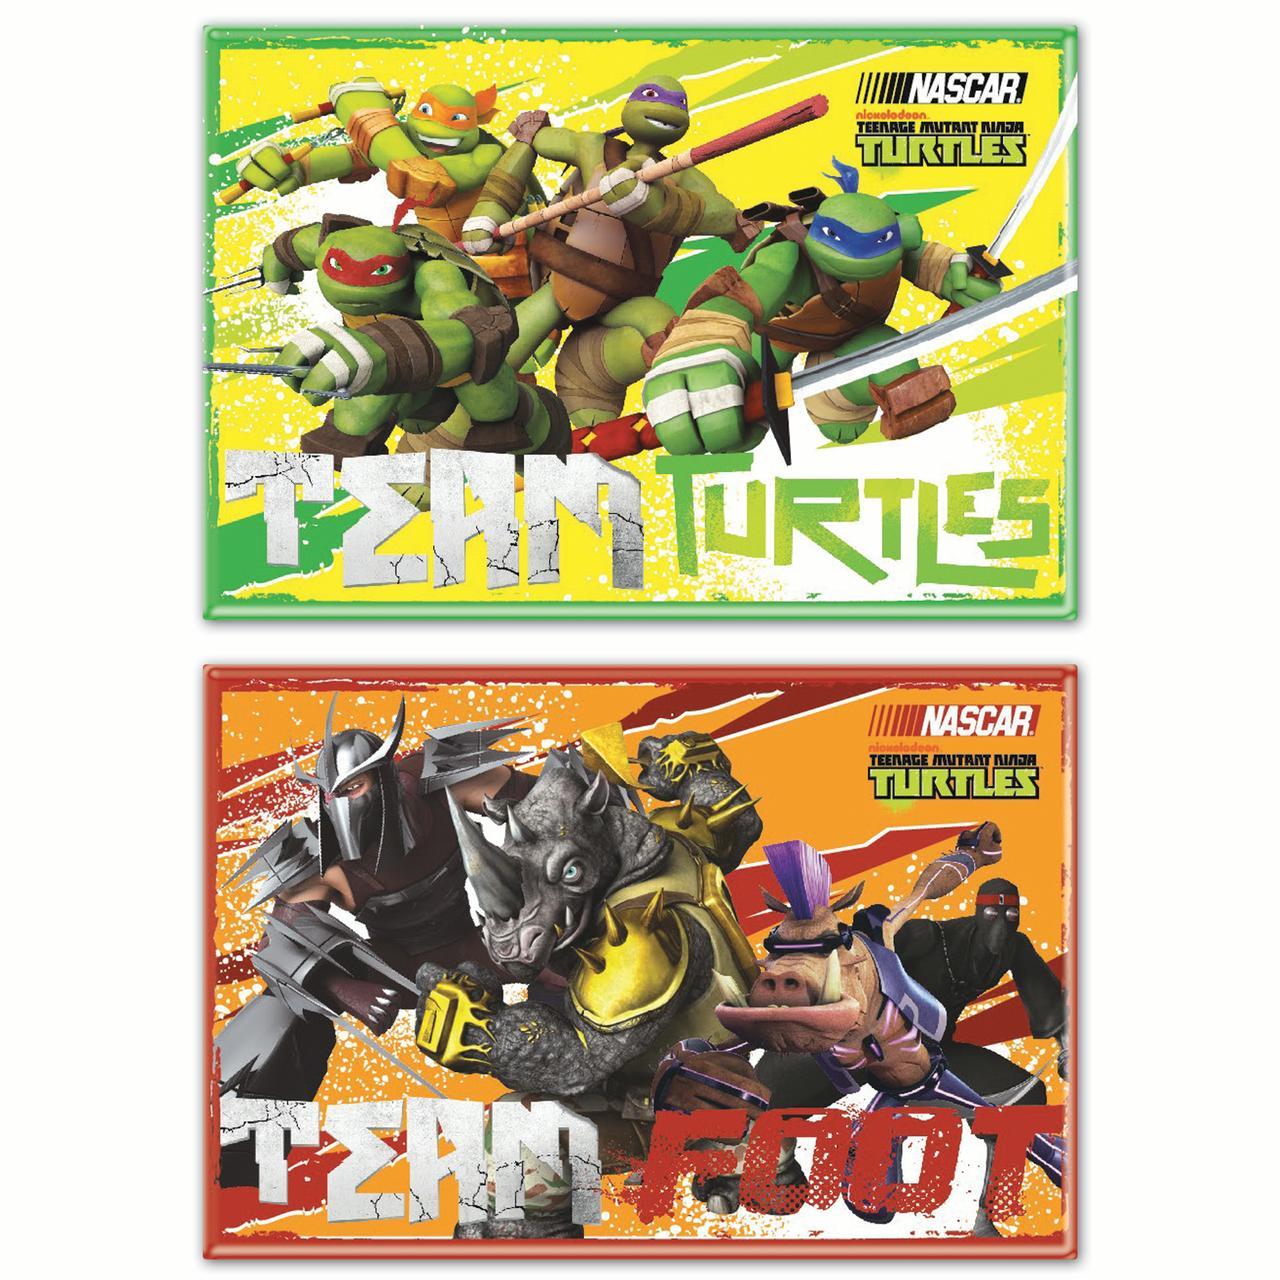 "Nascar WinCraft Teenage Mutant Ninja Turtles 2"" x 3"" 2-Pack Car Magnet Set No... by WINCRAFT INC."